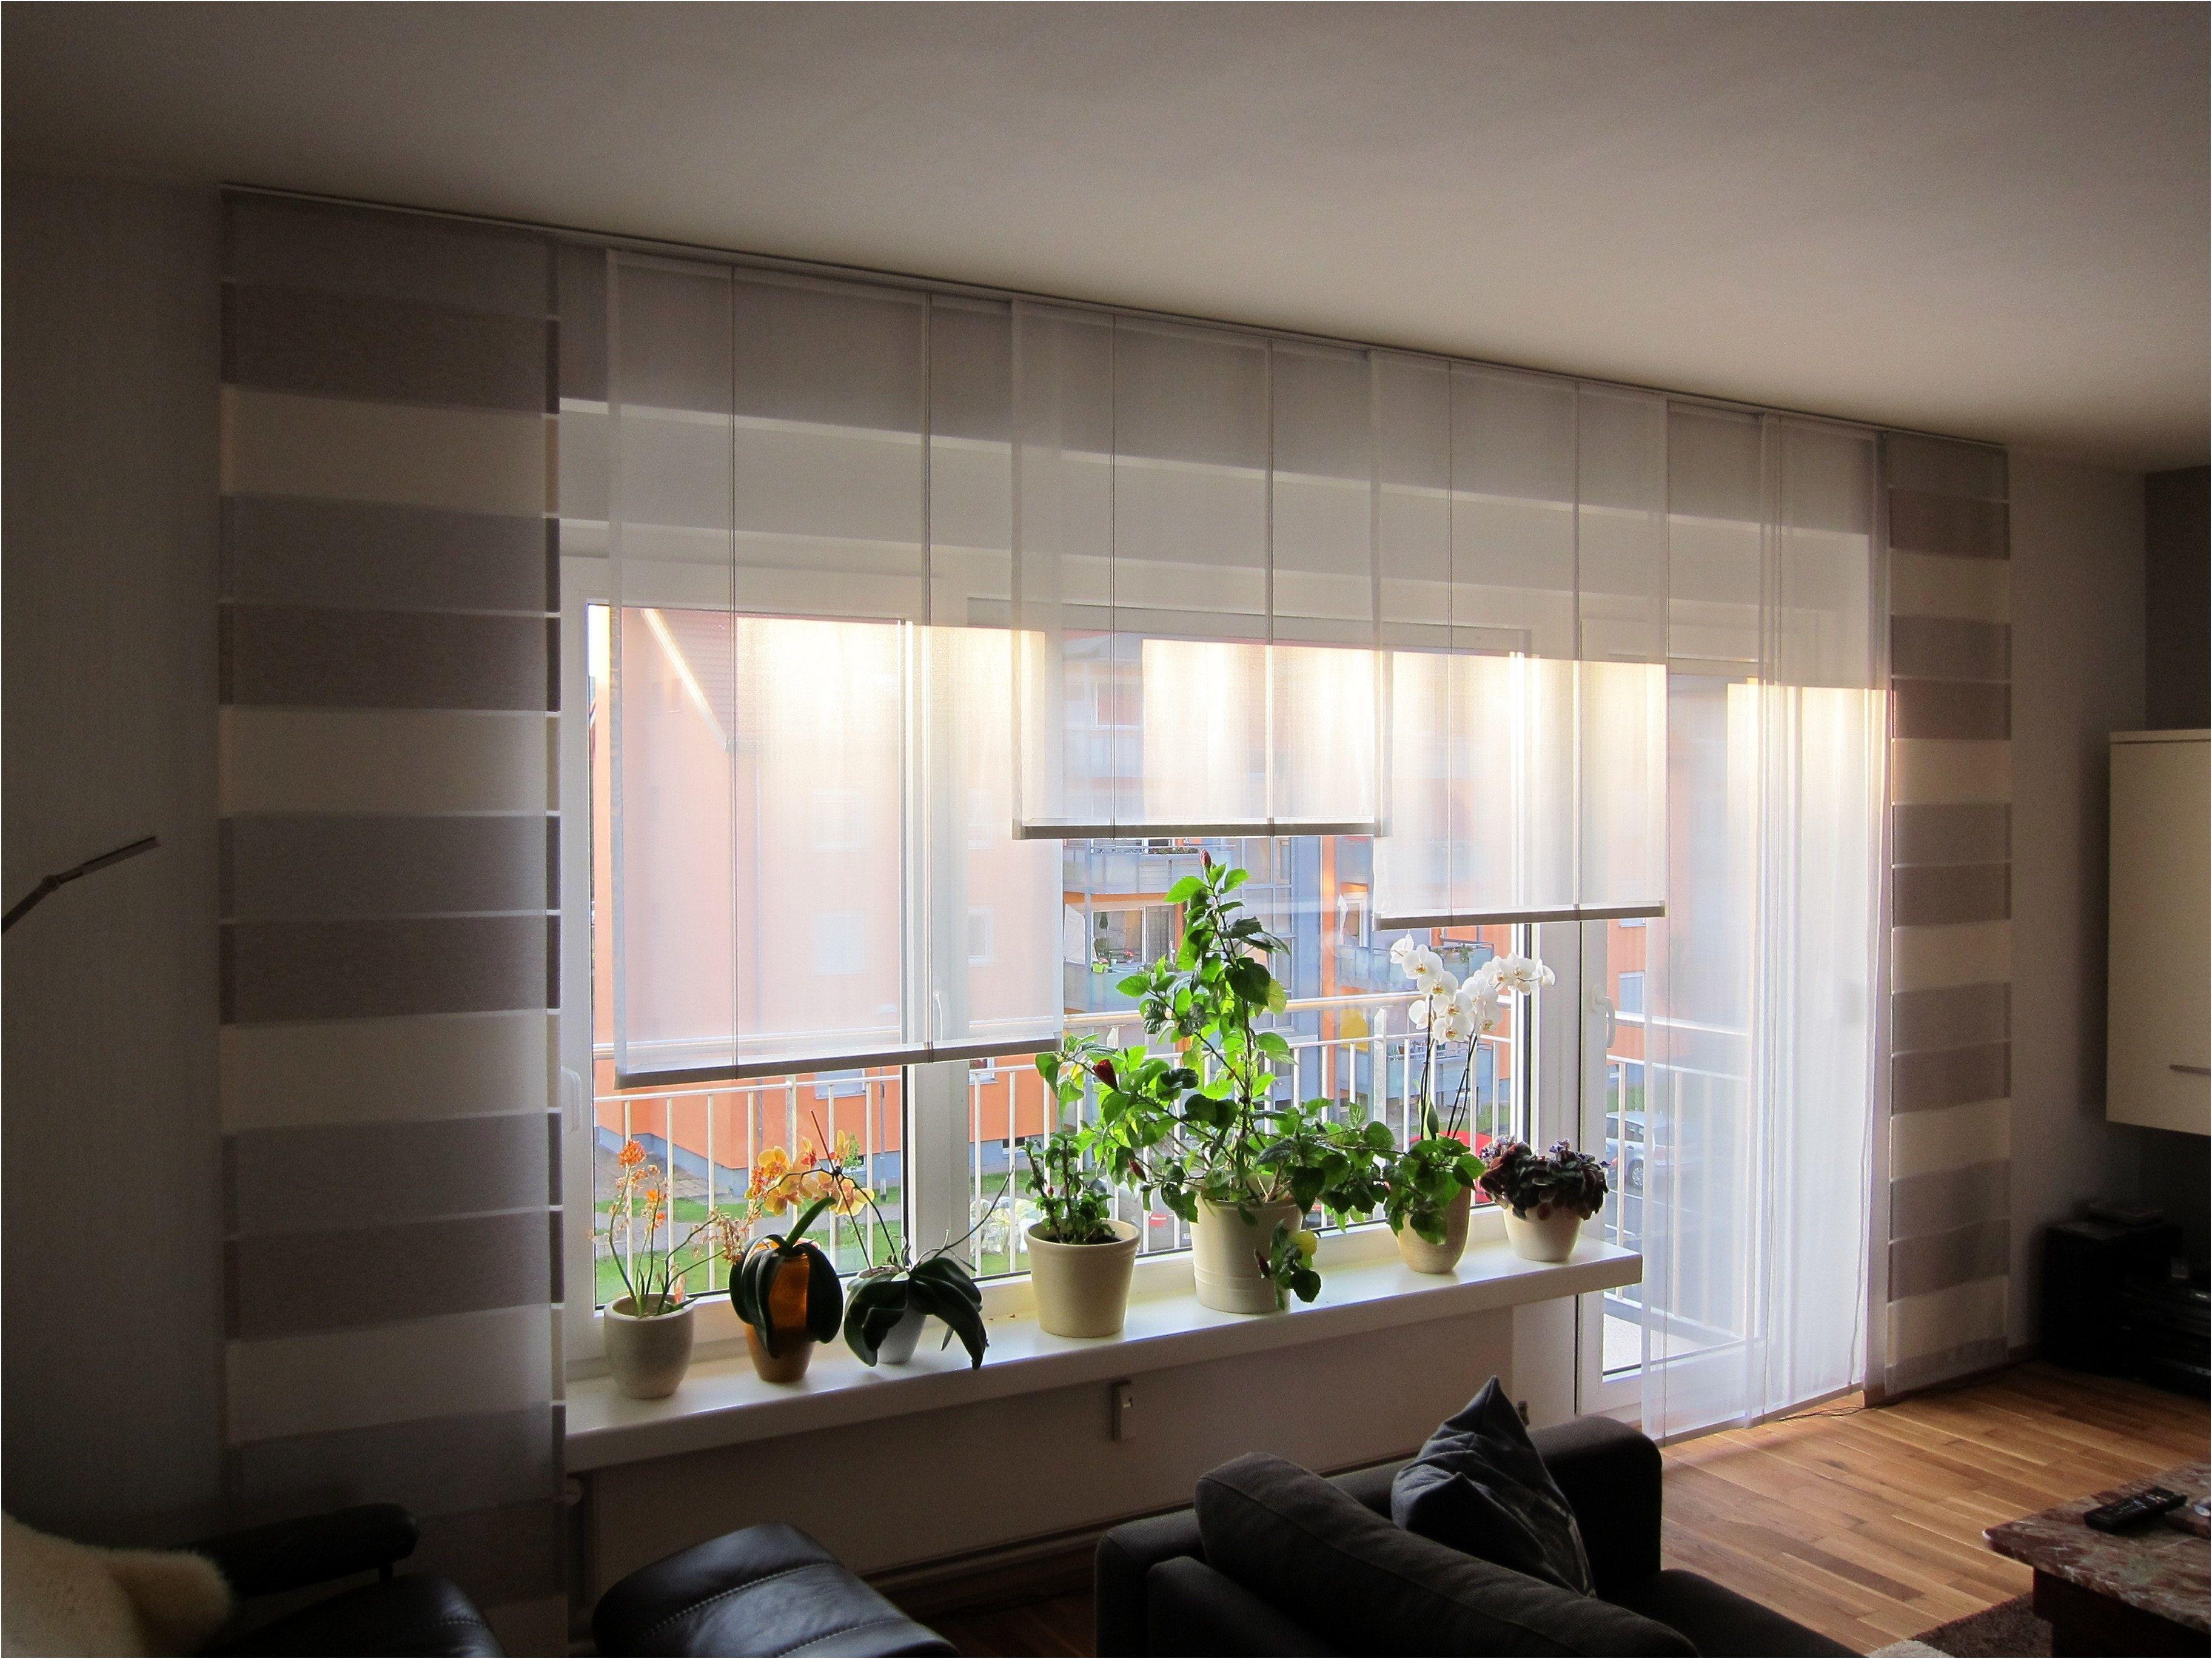 Ideal Balkontur Vorhang Aussen In 2020 Gardinen Wohnzimmer Vorhange Wohnzimmer Scheibengardinen Wohnzimmer